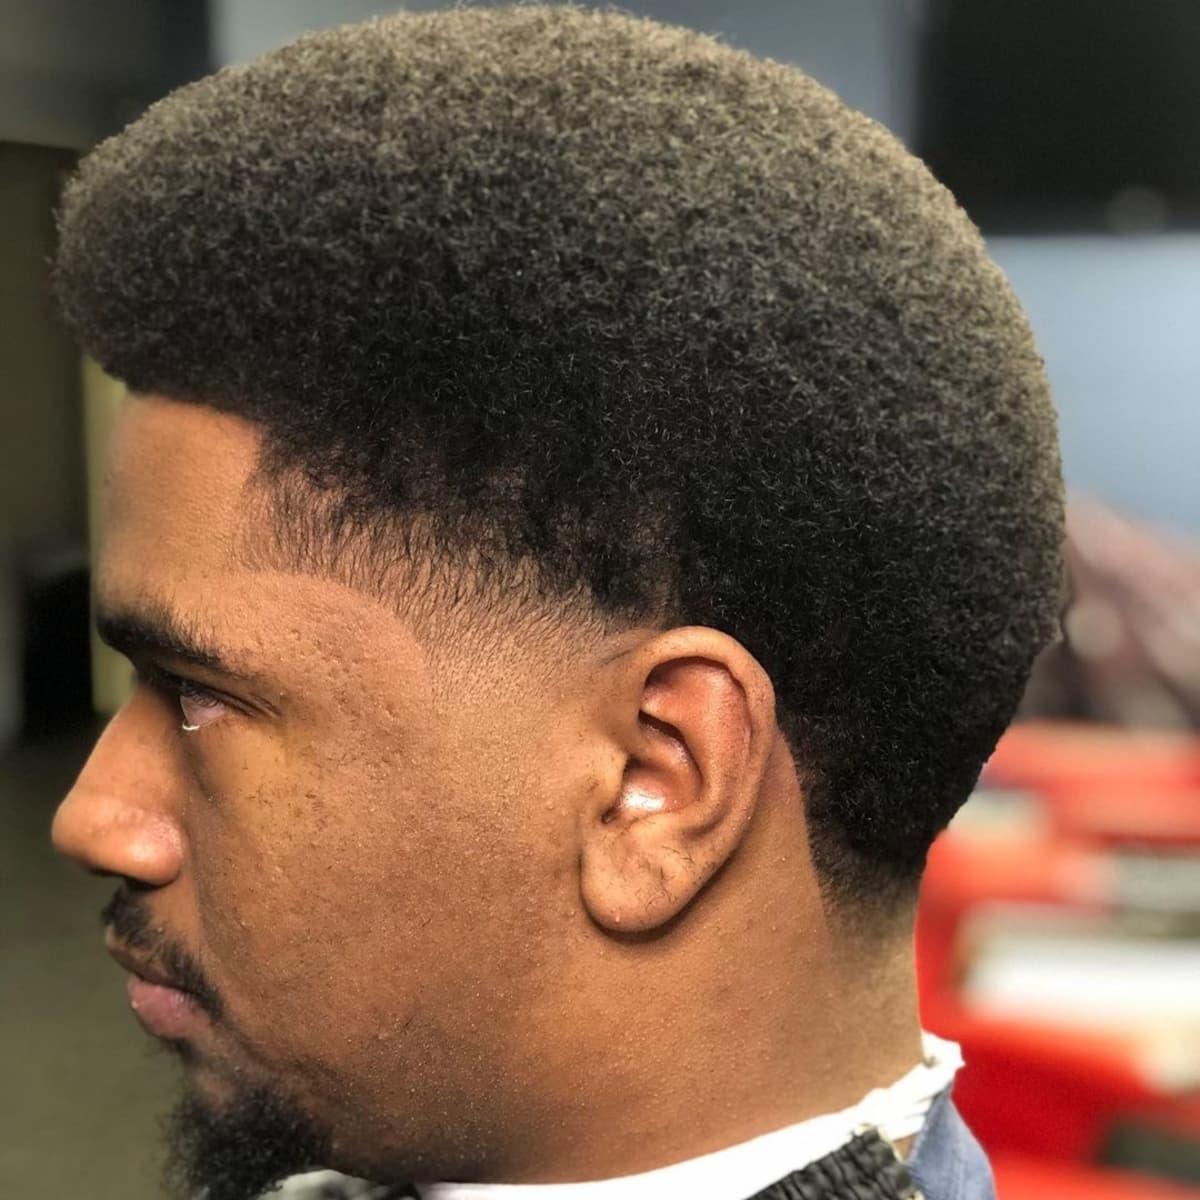 20 Coolest Temp Fade Haircut Ideas for Men